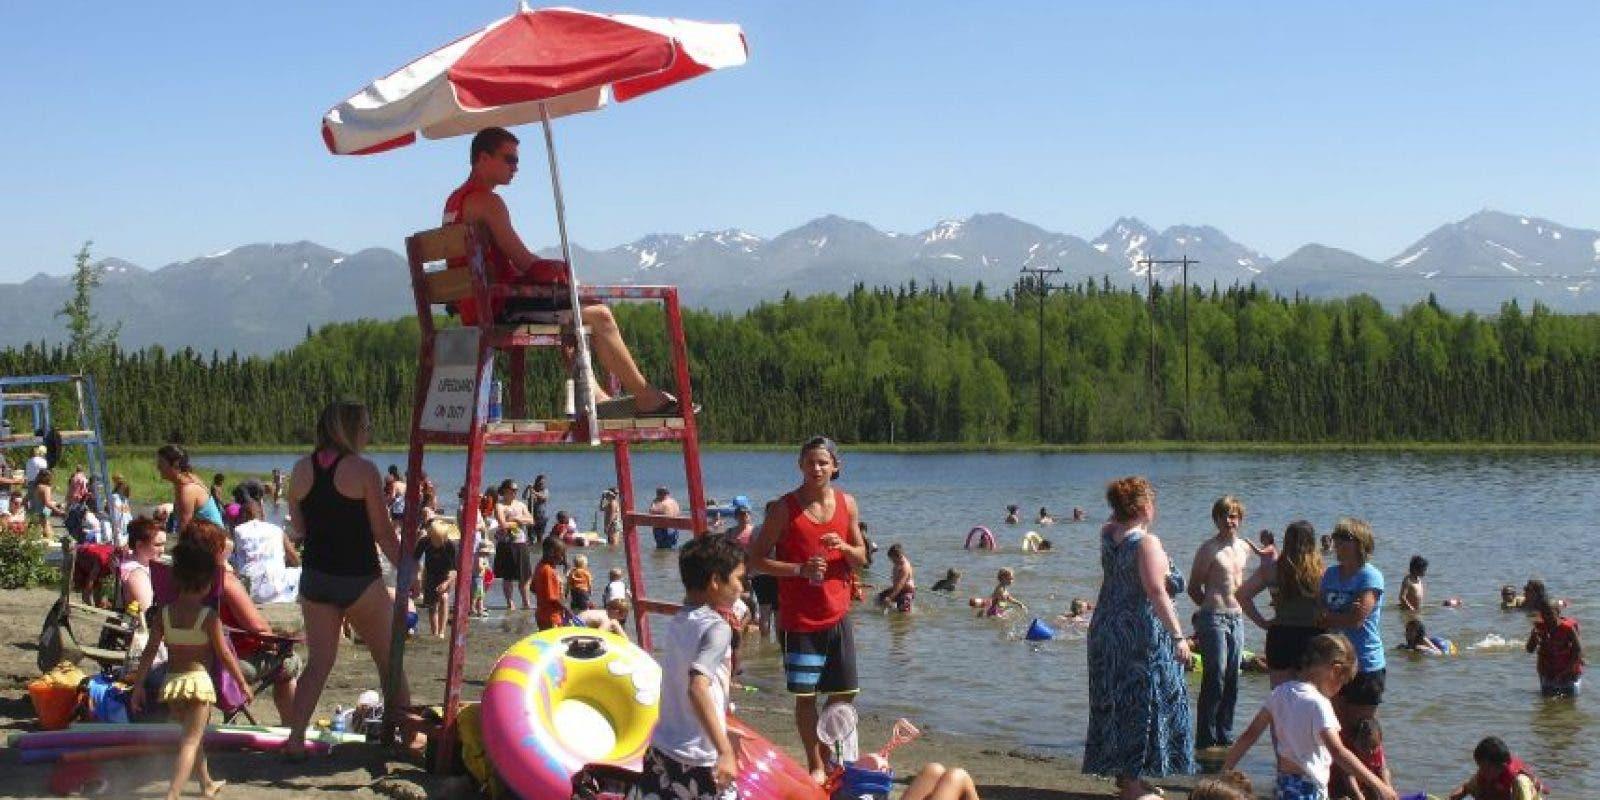 Mala noticia para todos: rompe récord Alaska en alta temperatura